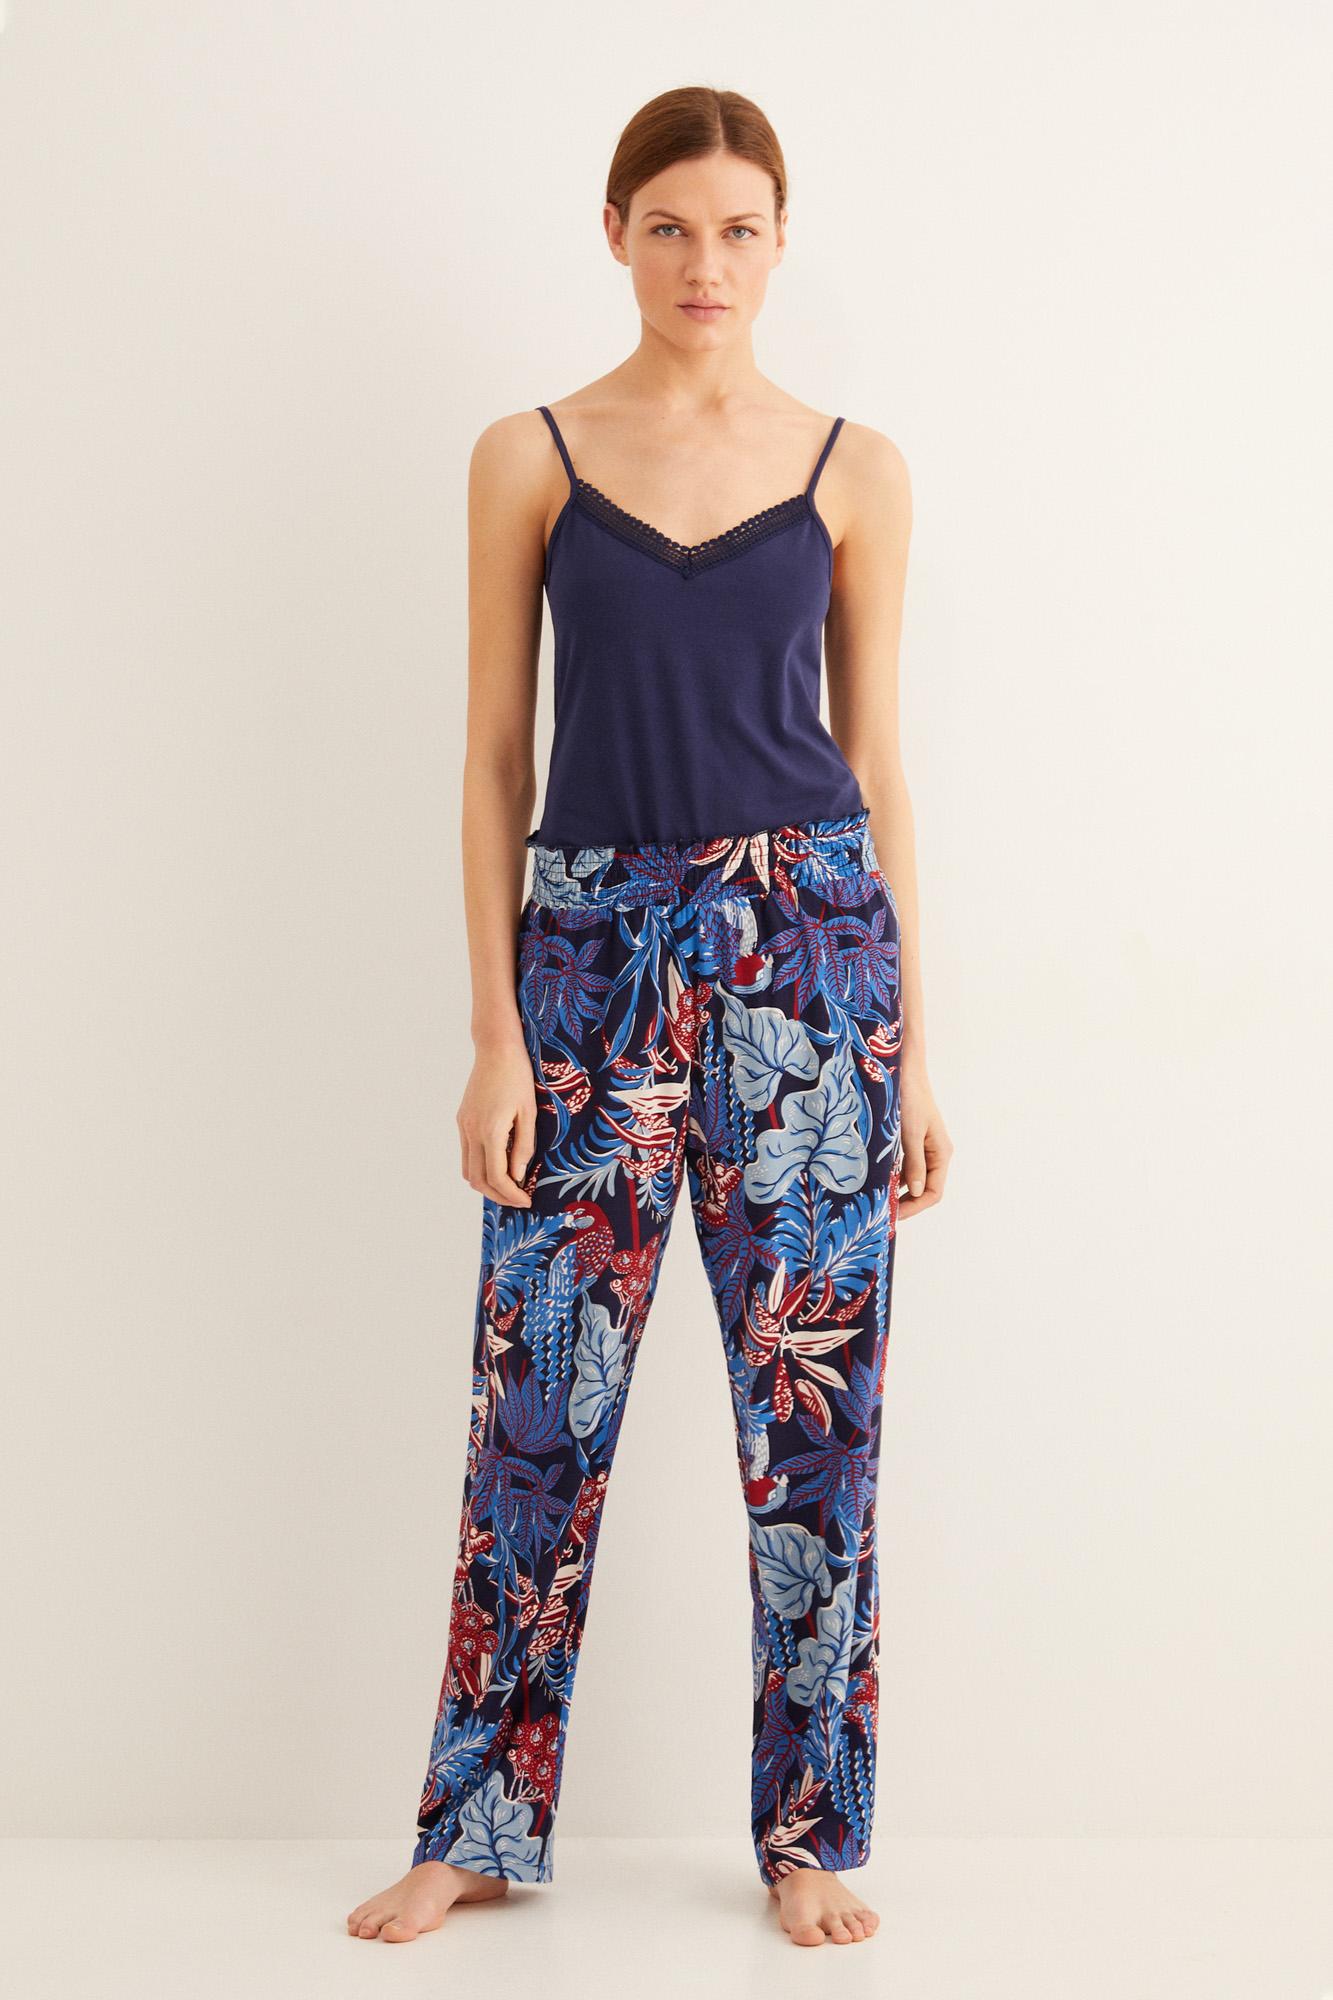 Pantalón pijama largo estampado